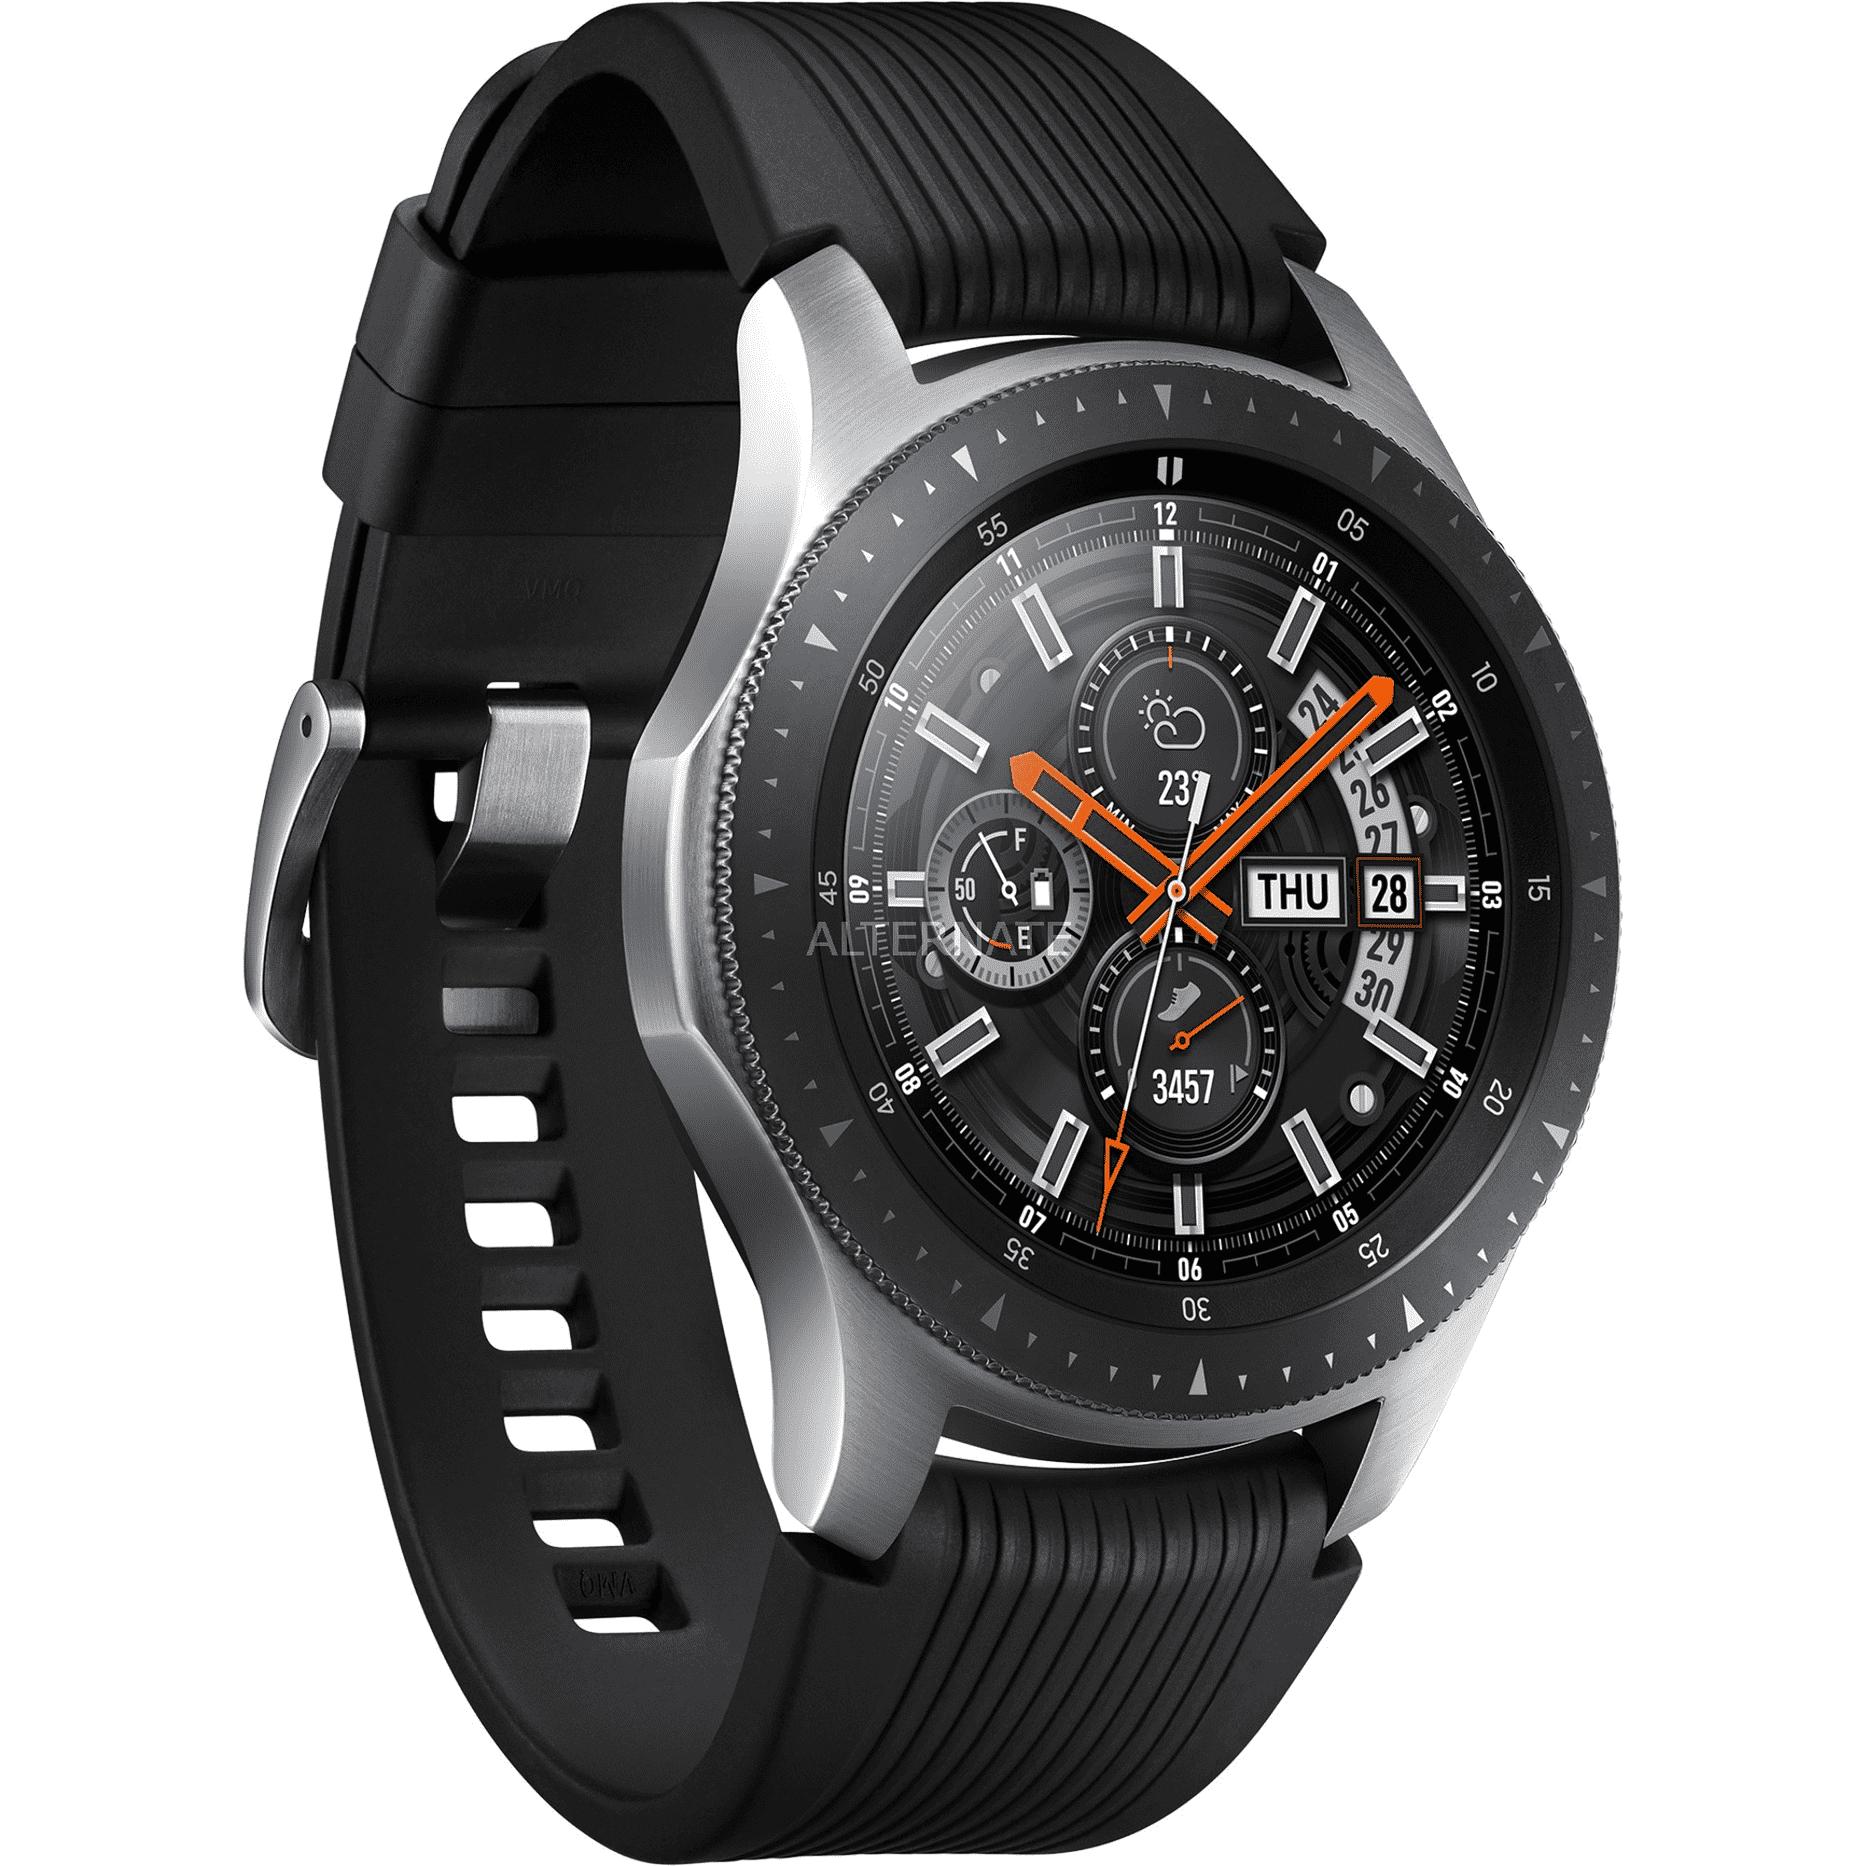 Montre connectée Samsung Galaxy Watch - 46mm (+34,33€ en Superpoints)